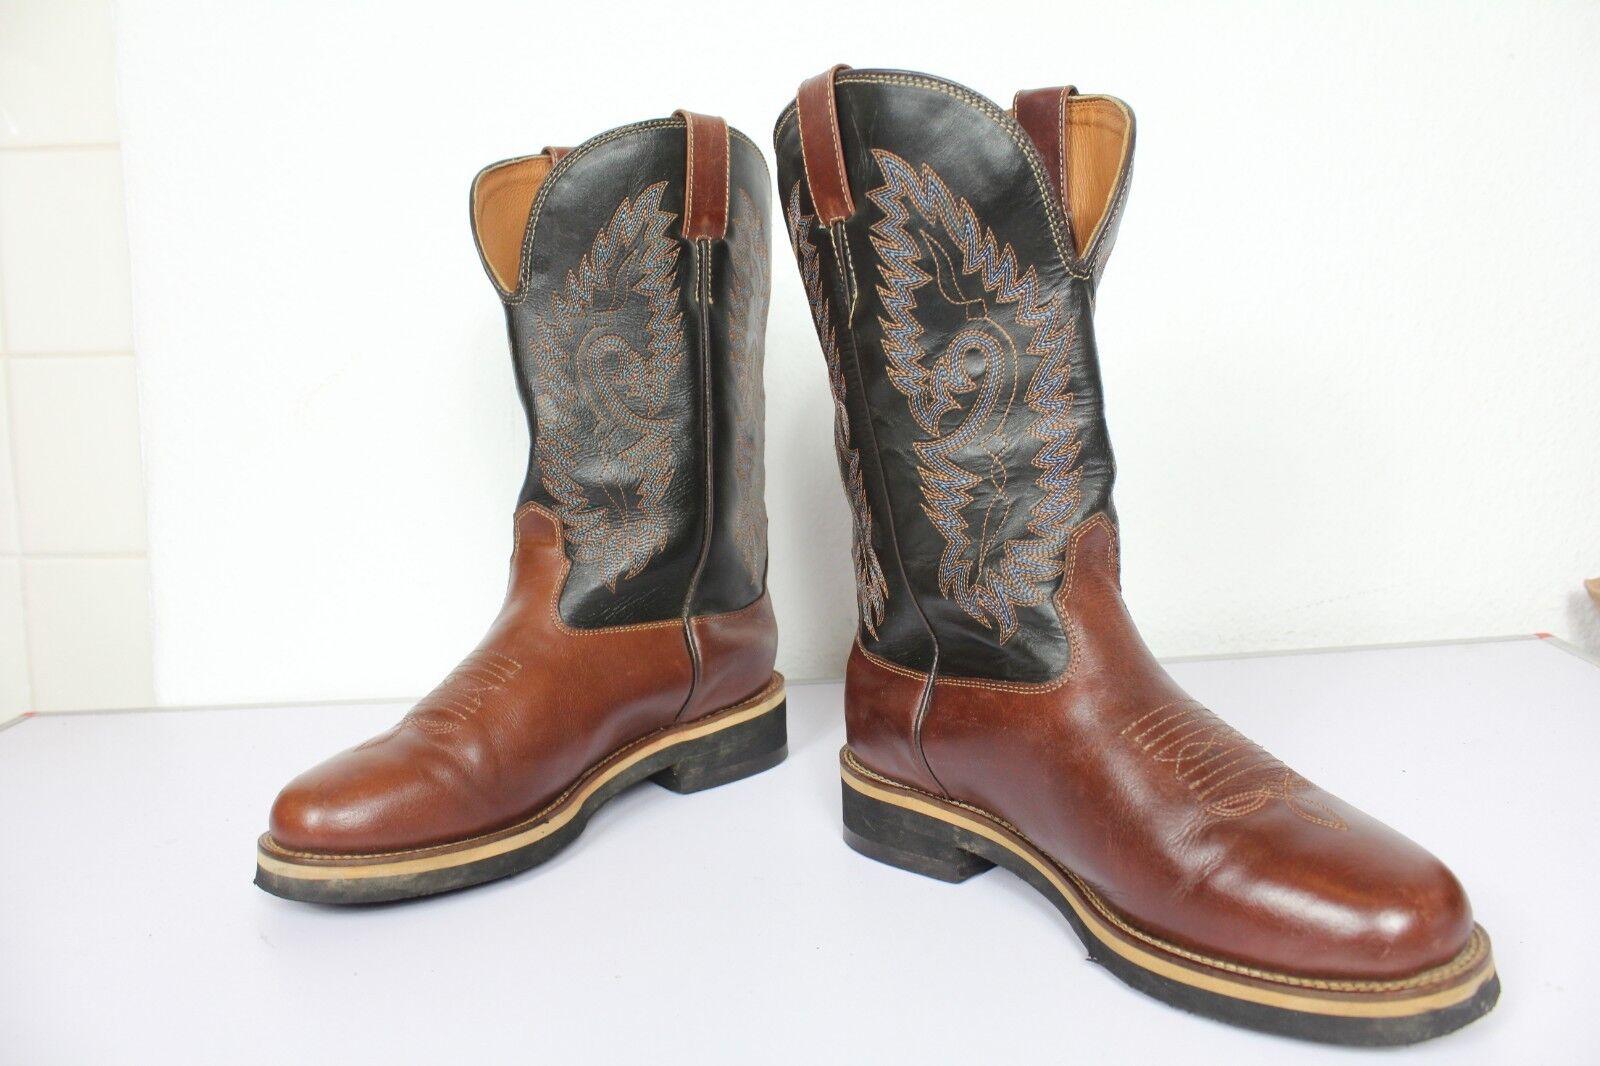 Amazing Western High Stiefel Cowboystiefel Bikerstiefel Echtleder Mehrfarbig Eu 41